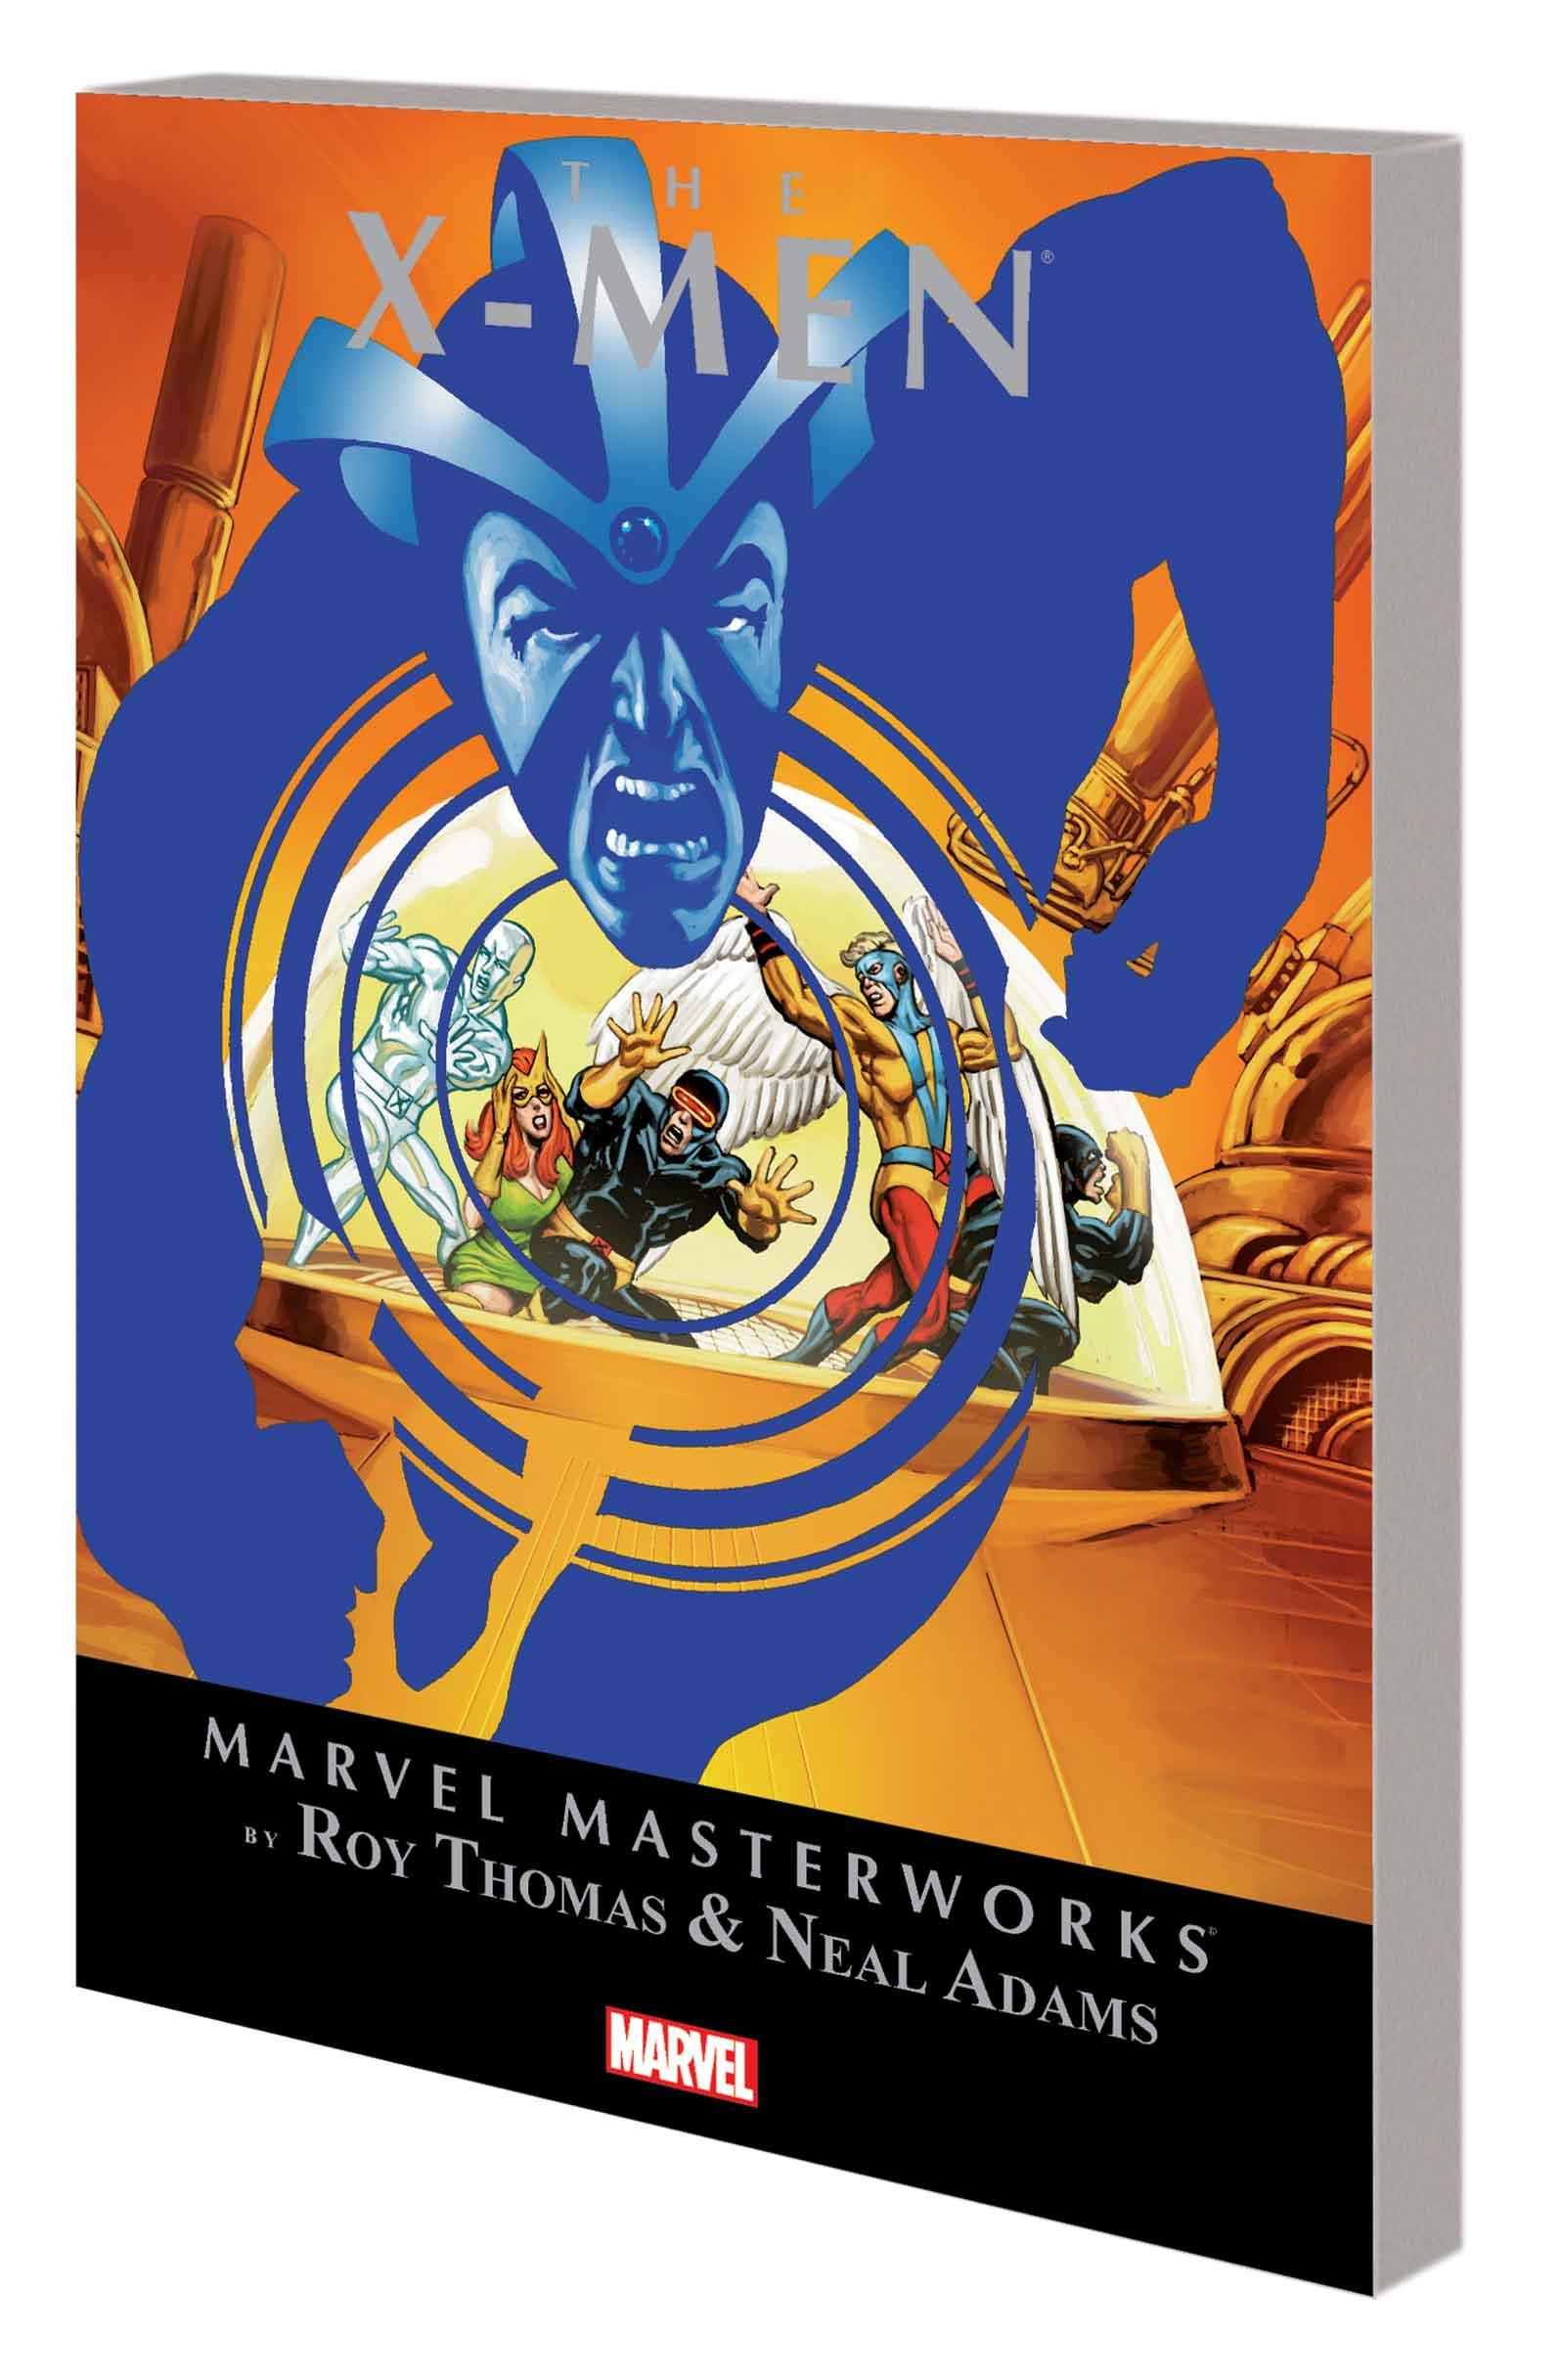 Marvel Masterworks: The X-Men (Trade Paperback)